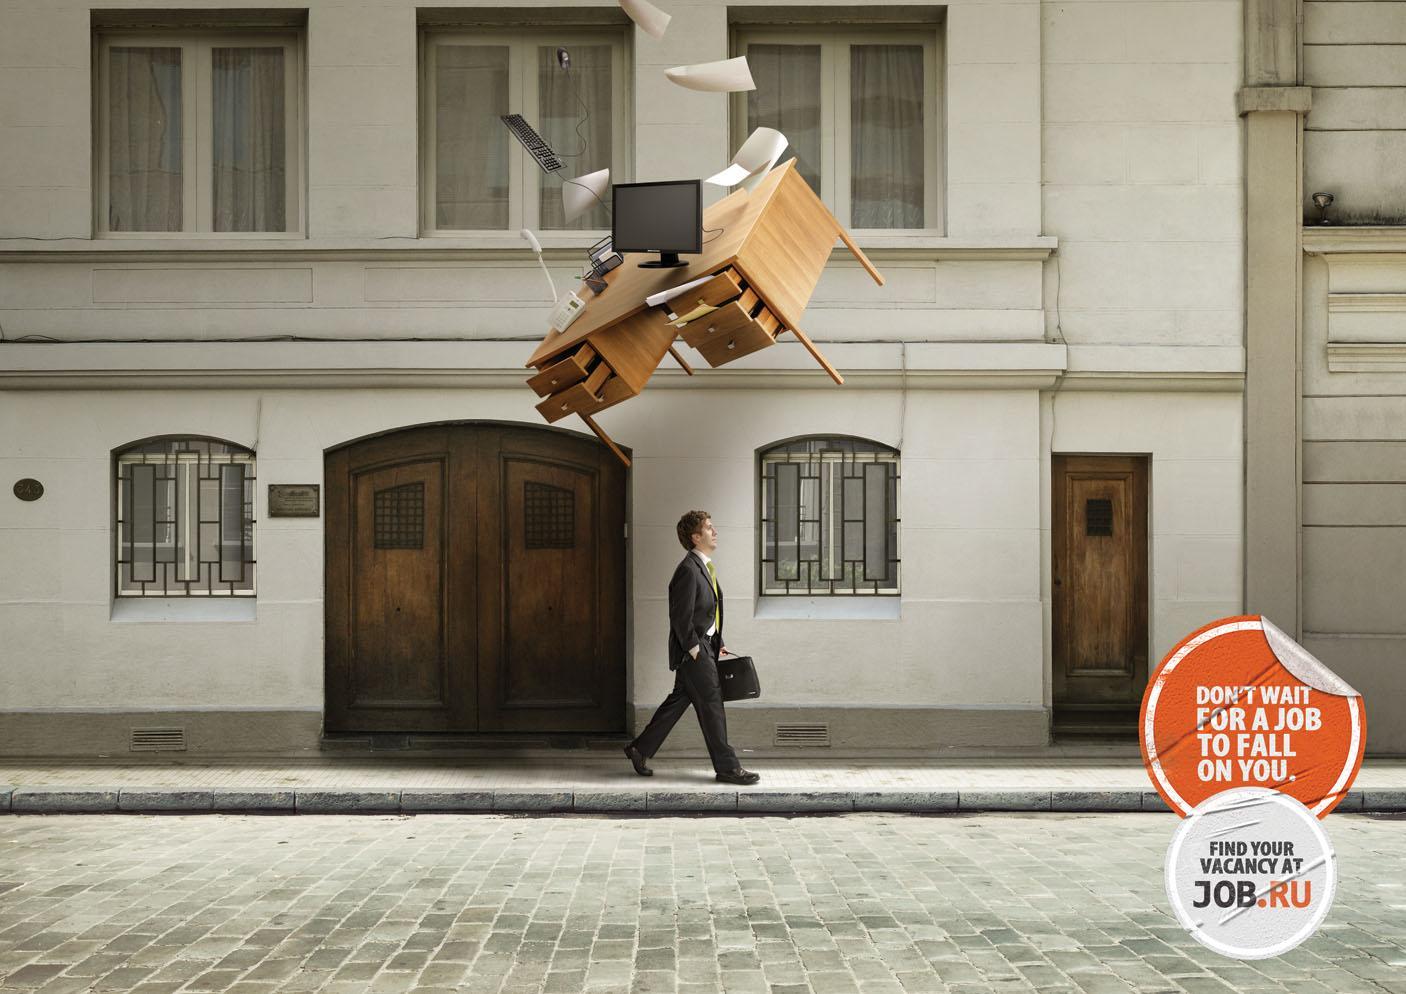 job.ru Print Ad -  Fall, Clerk